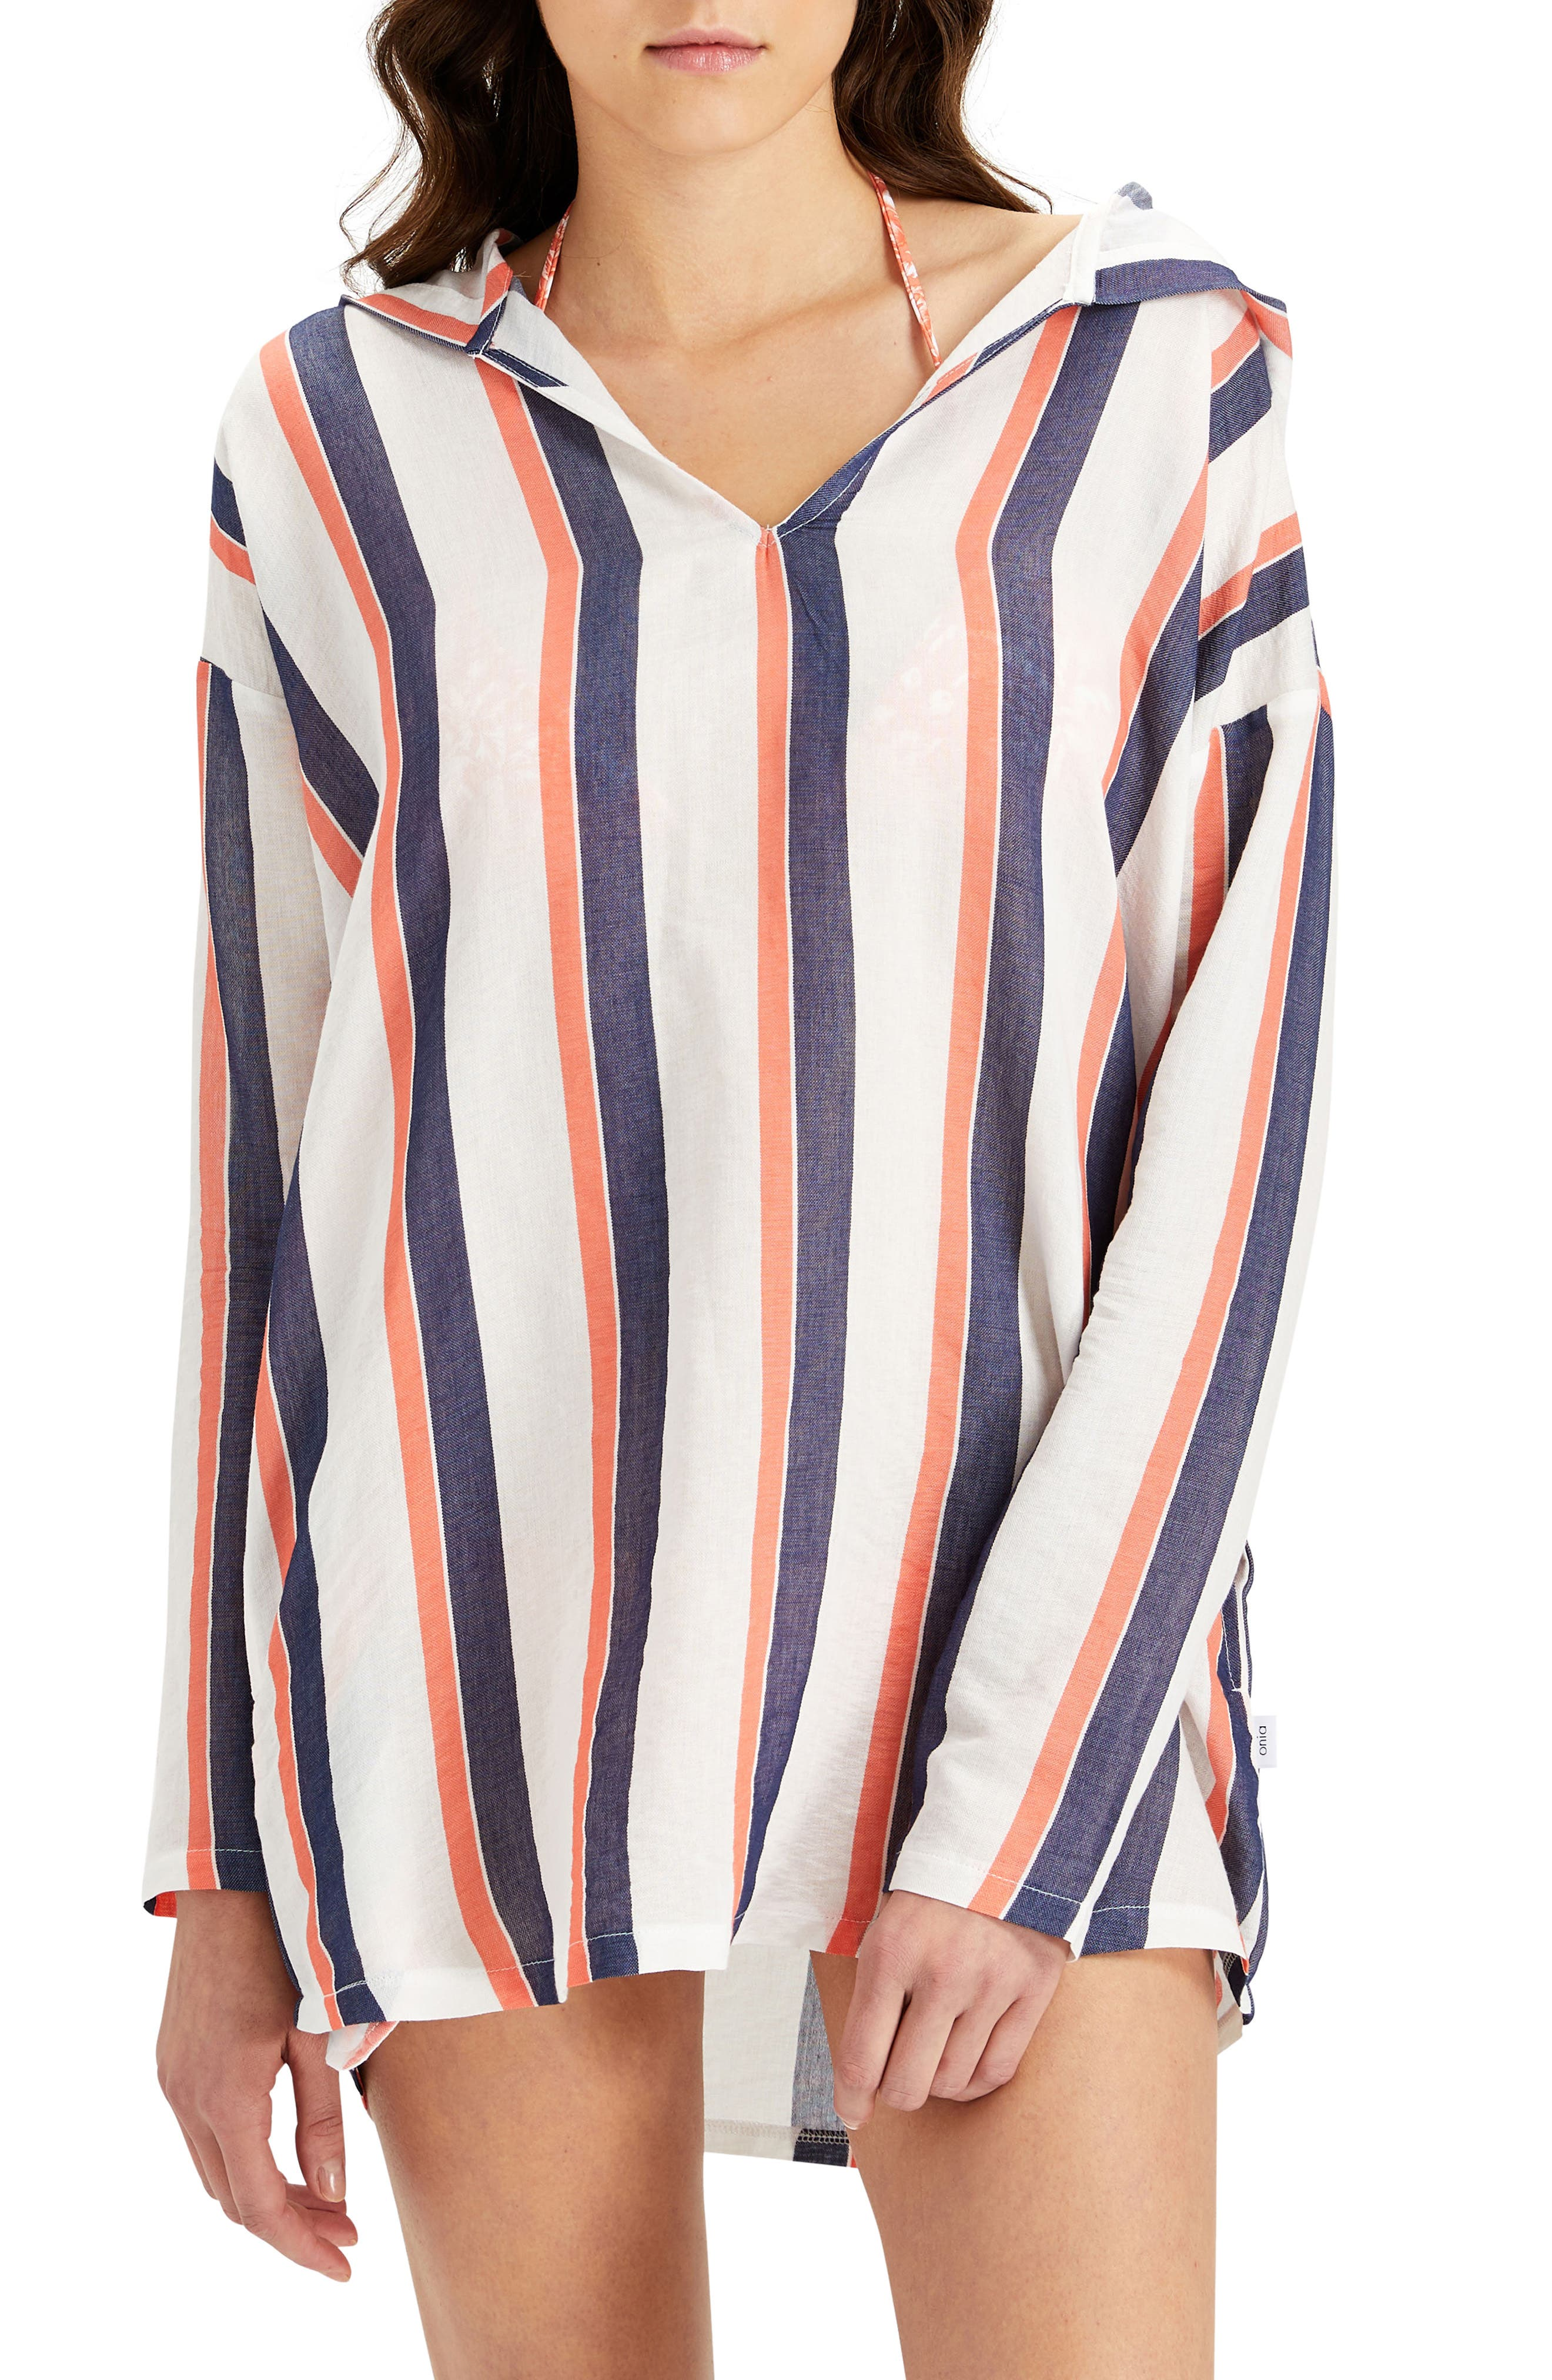 Sophia Stripe Hooded Cover-Up Tunic,                             Main thumbnail 1, color,                             822